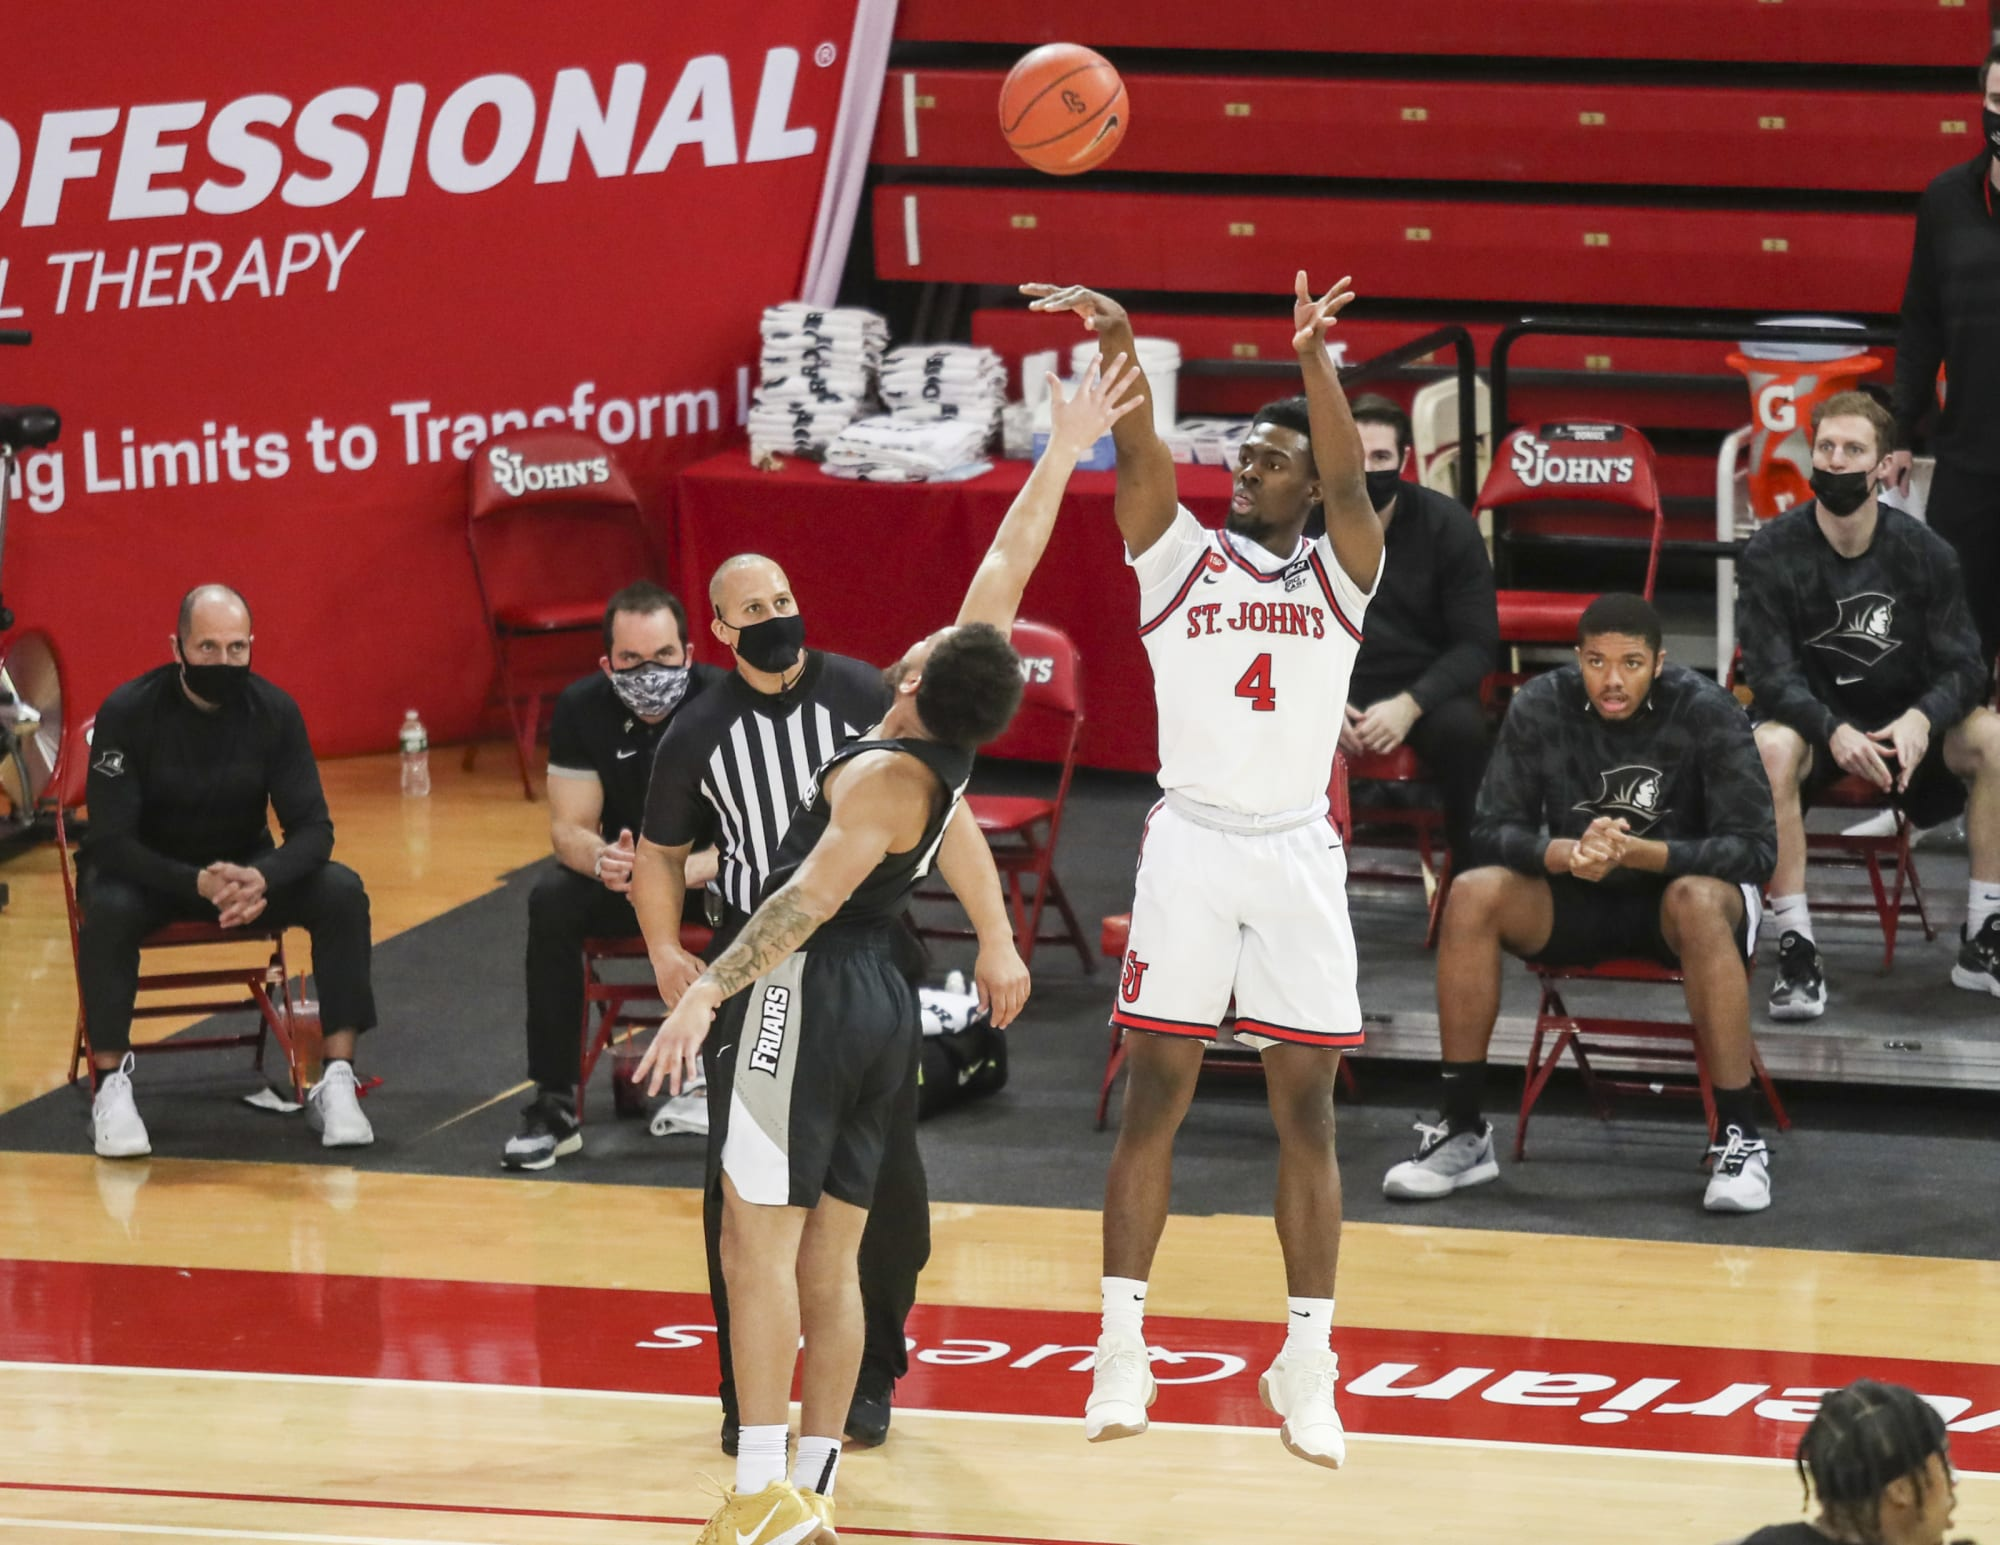 St. John's basketball guard Greg Williams Jr. is heading home